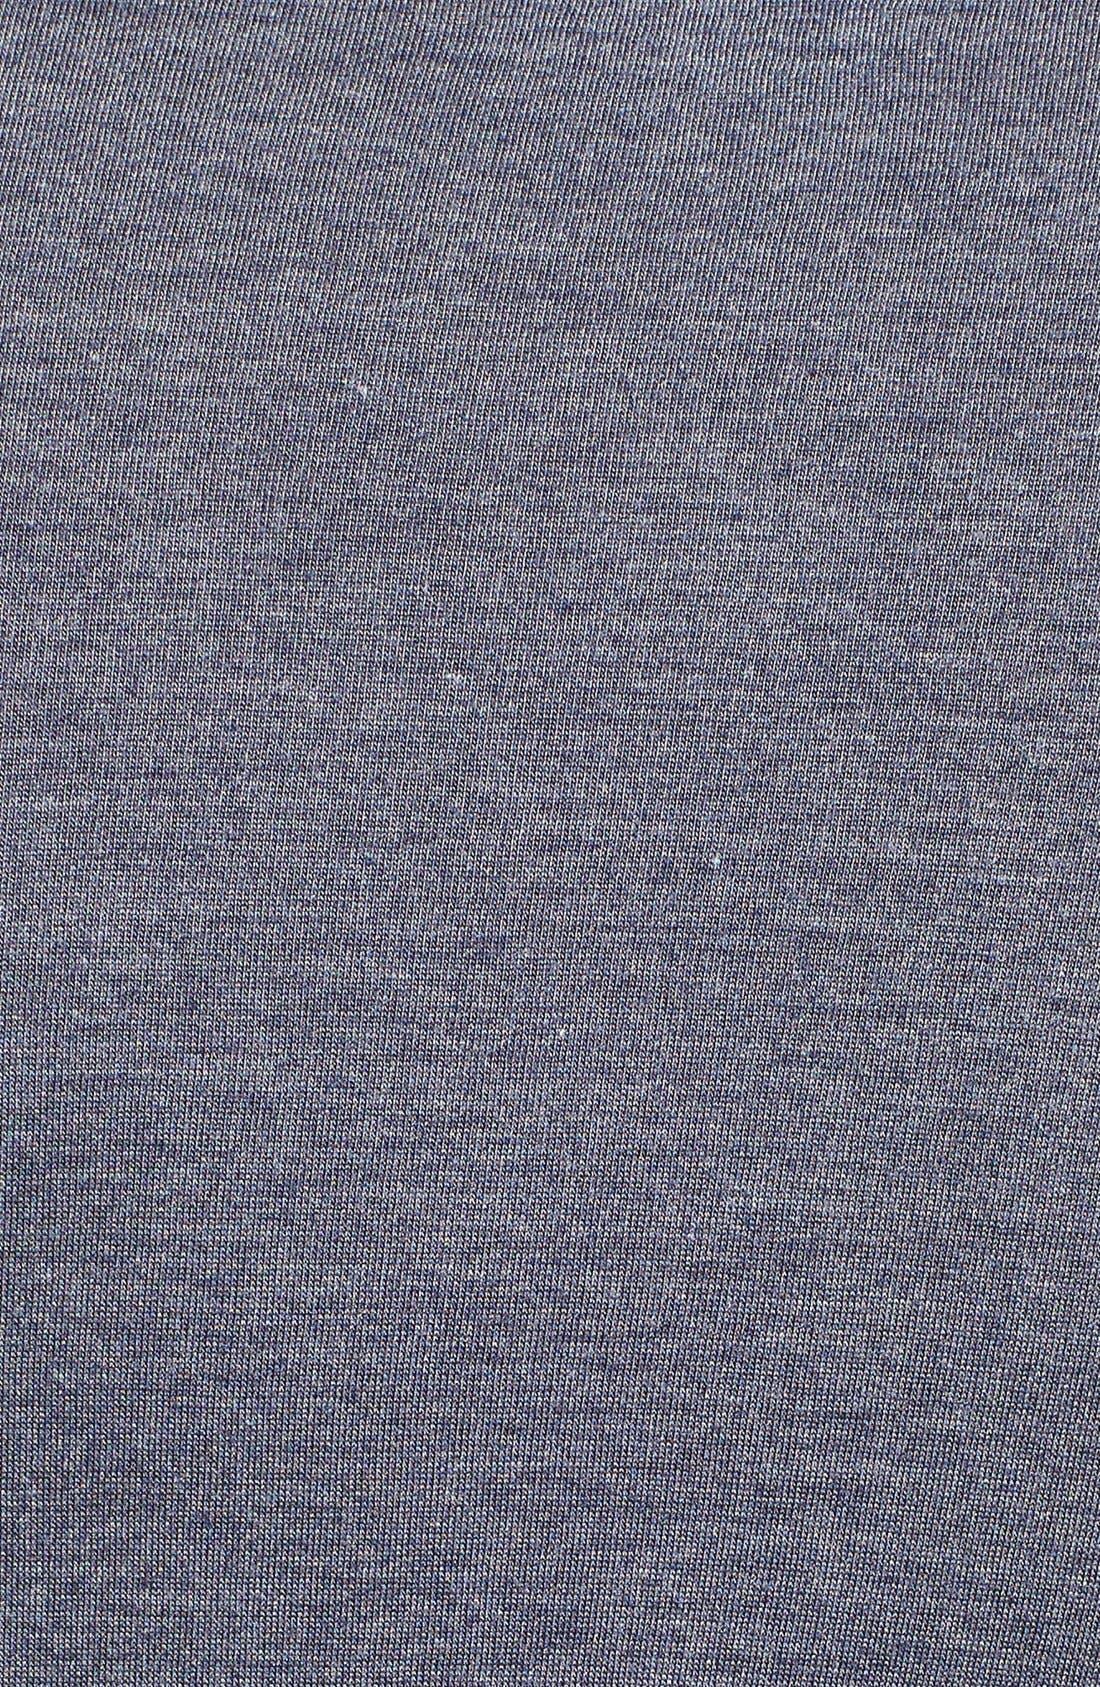 Alternate Image 5  - Calvin Klein 'Liquid Lounge' V-Neck T-Shirt